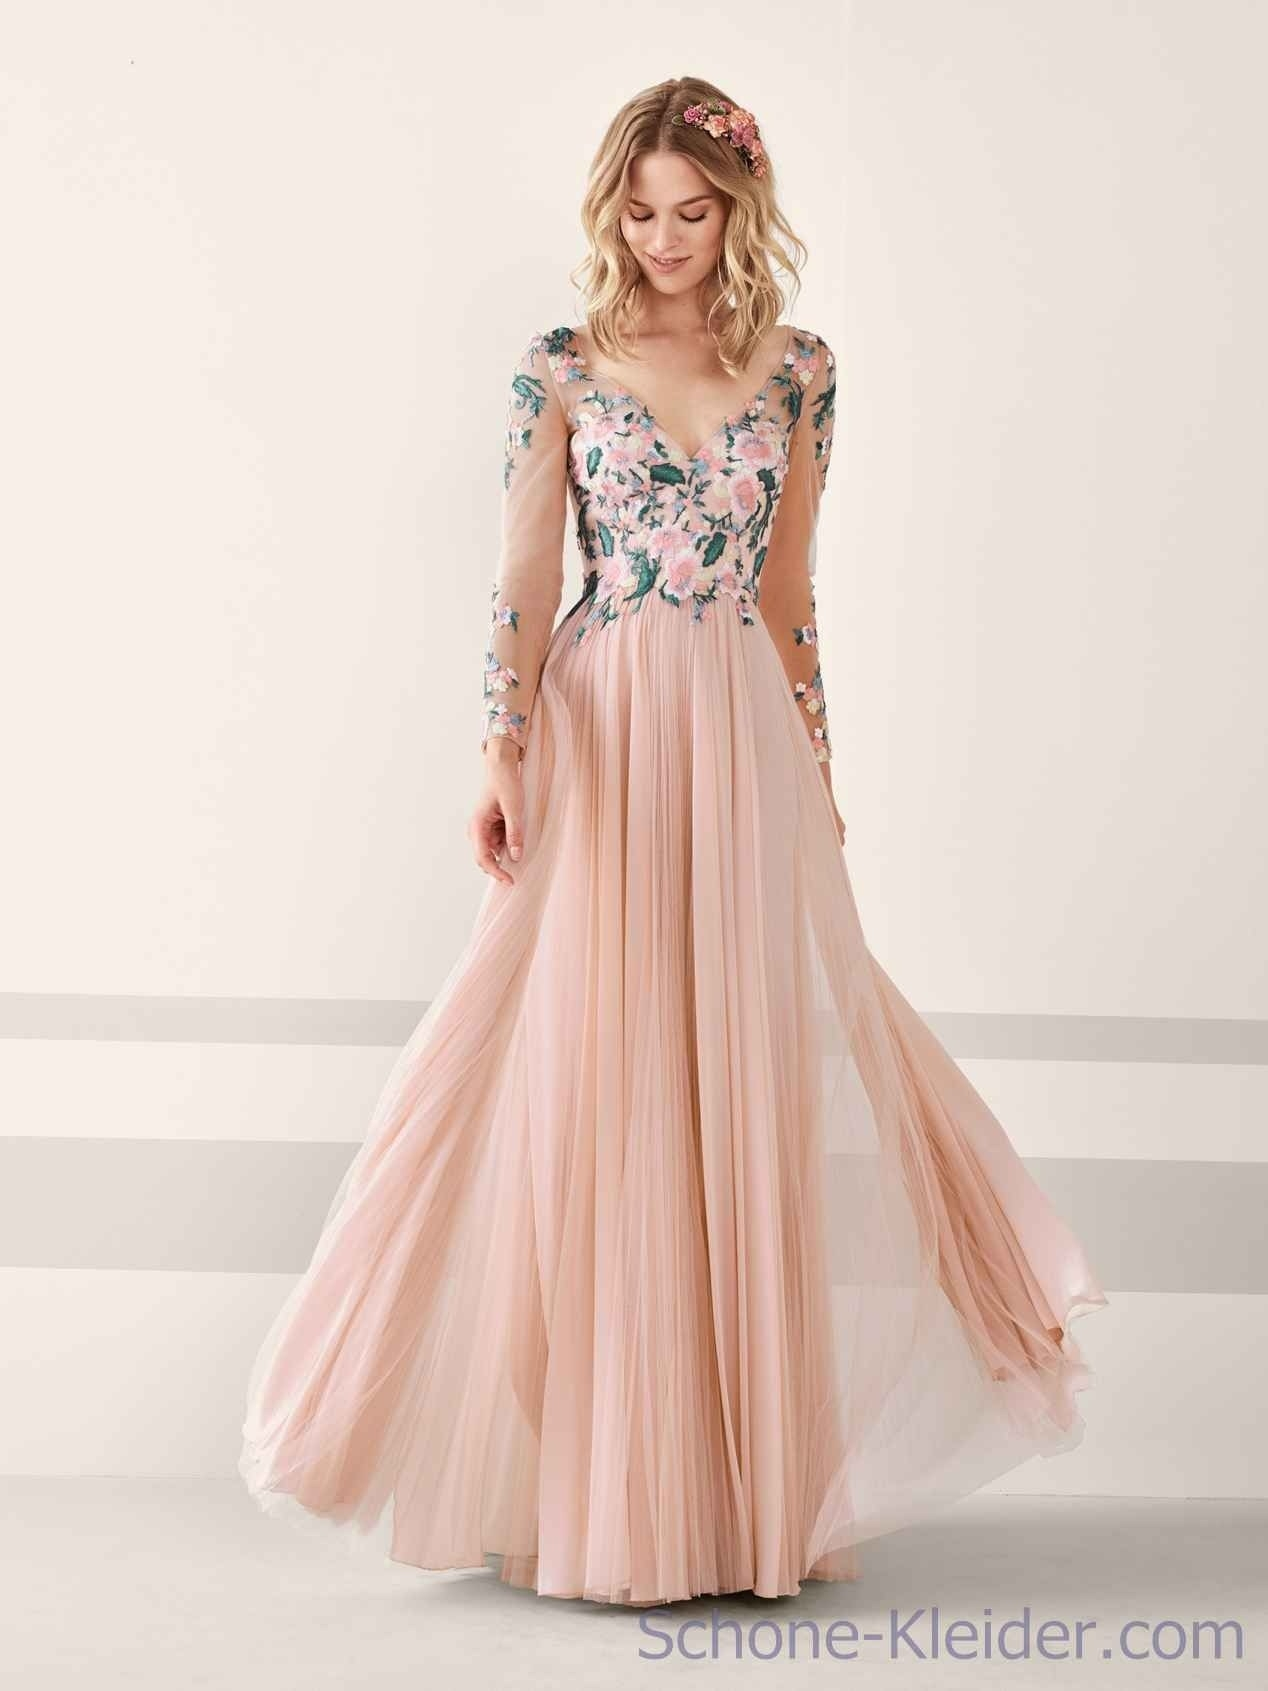 Designer Genial Kleid Lang Festlich Spezialgebiet10 Leicht Kleid Lang Festlich Spezialgebiet